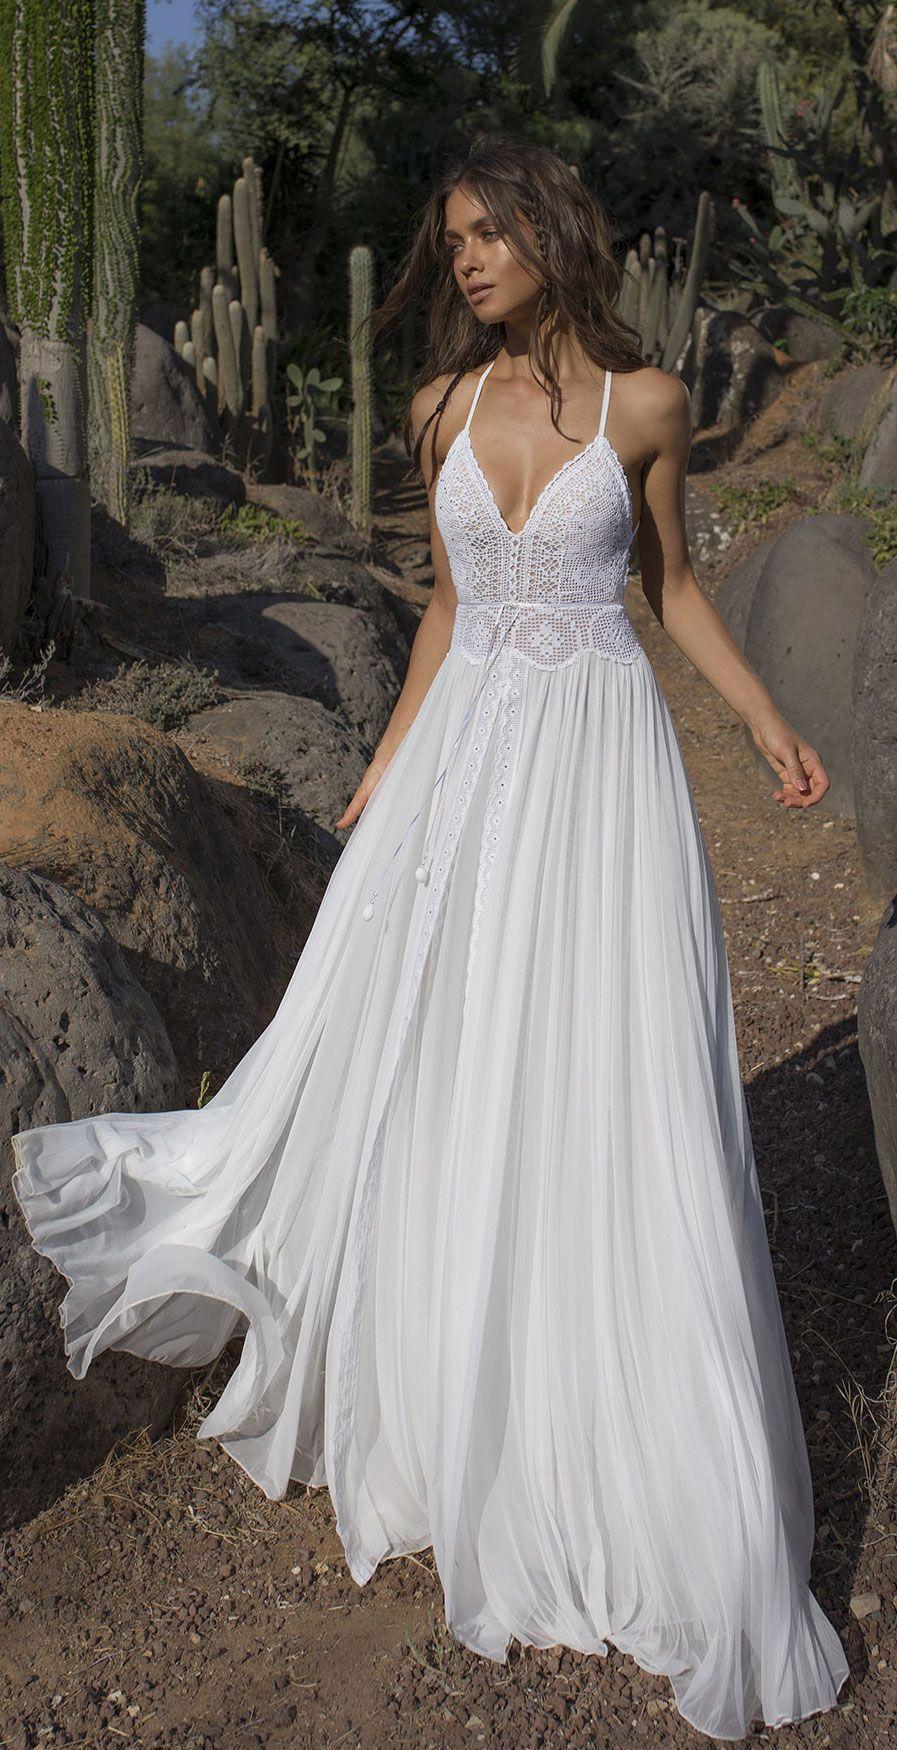 32 Beach Wedding Dresses Perfect For A Destination Wedding